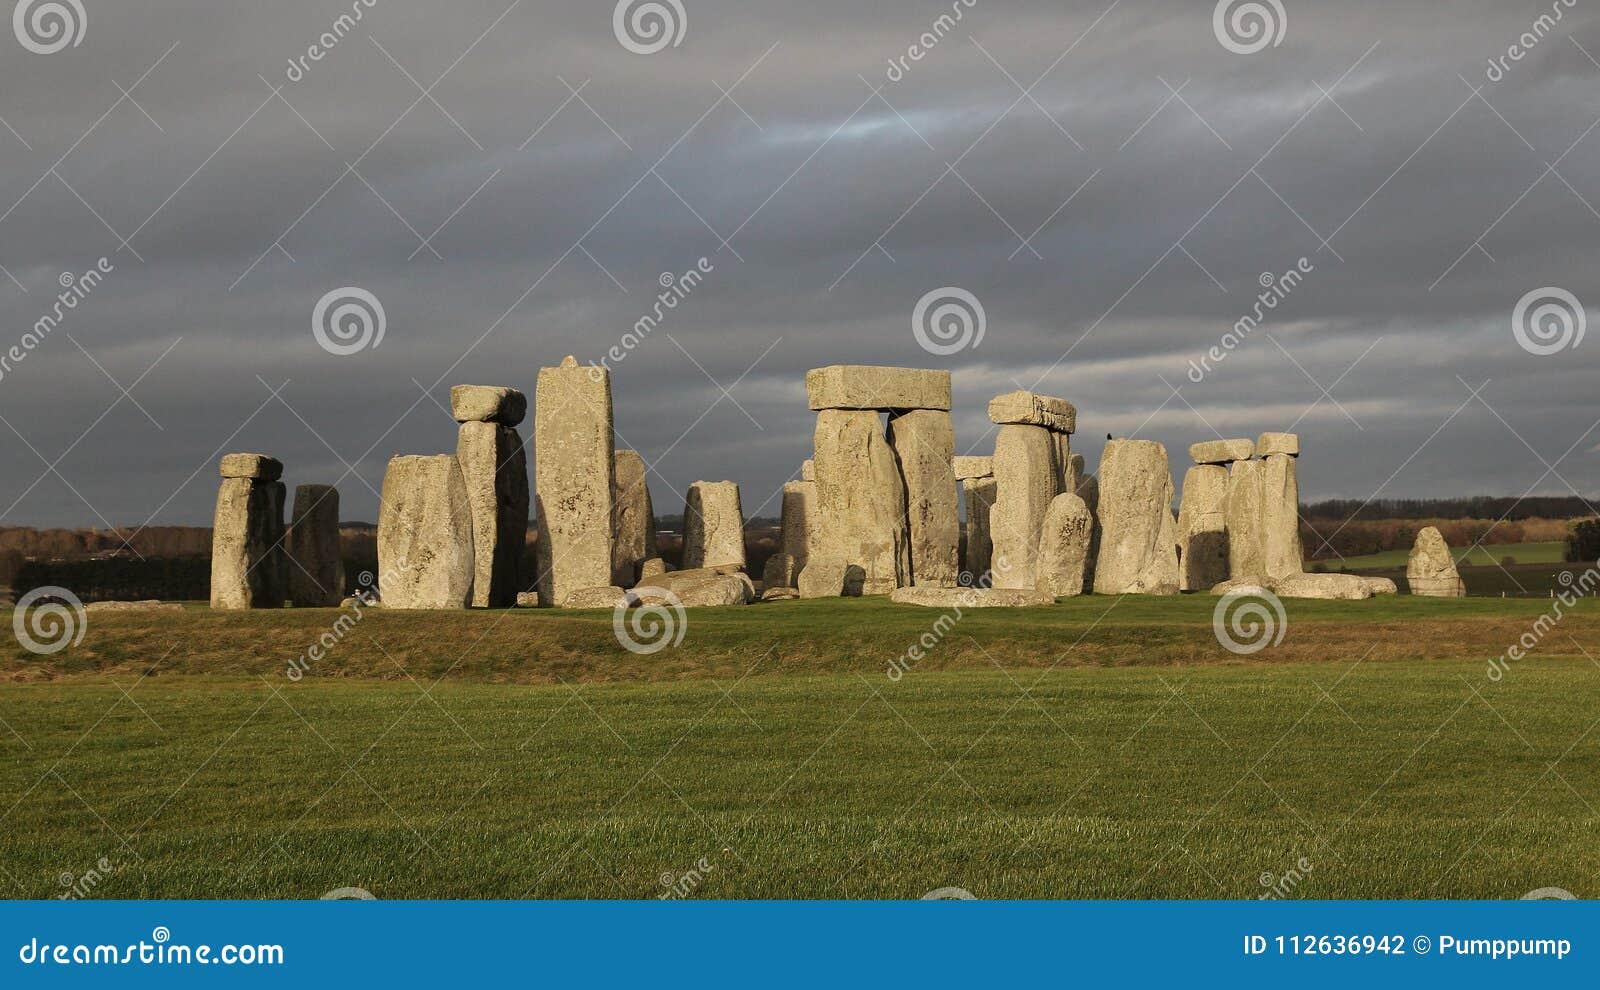 the stones of Stonehenge, England